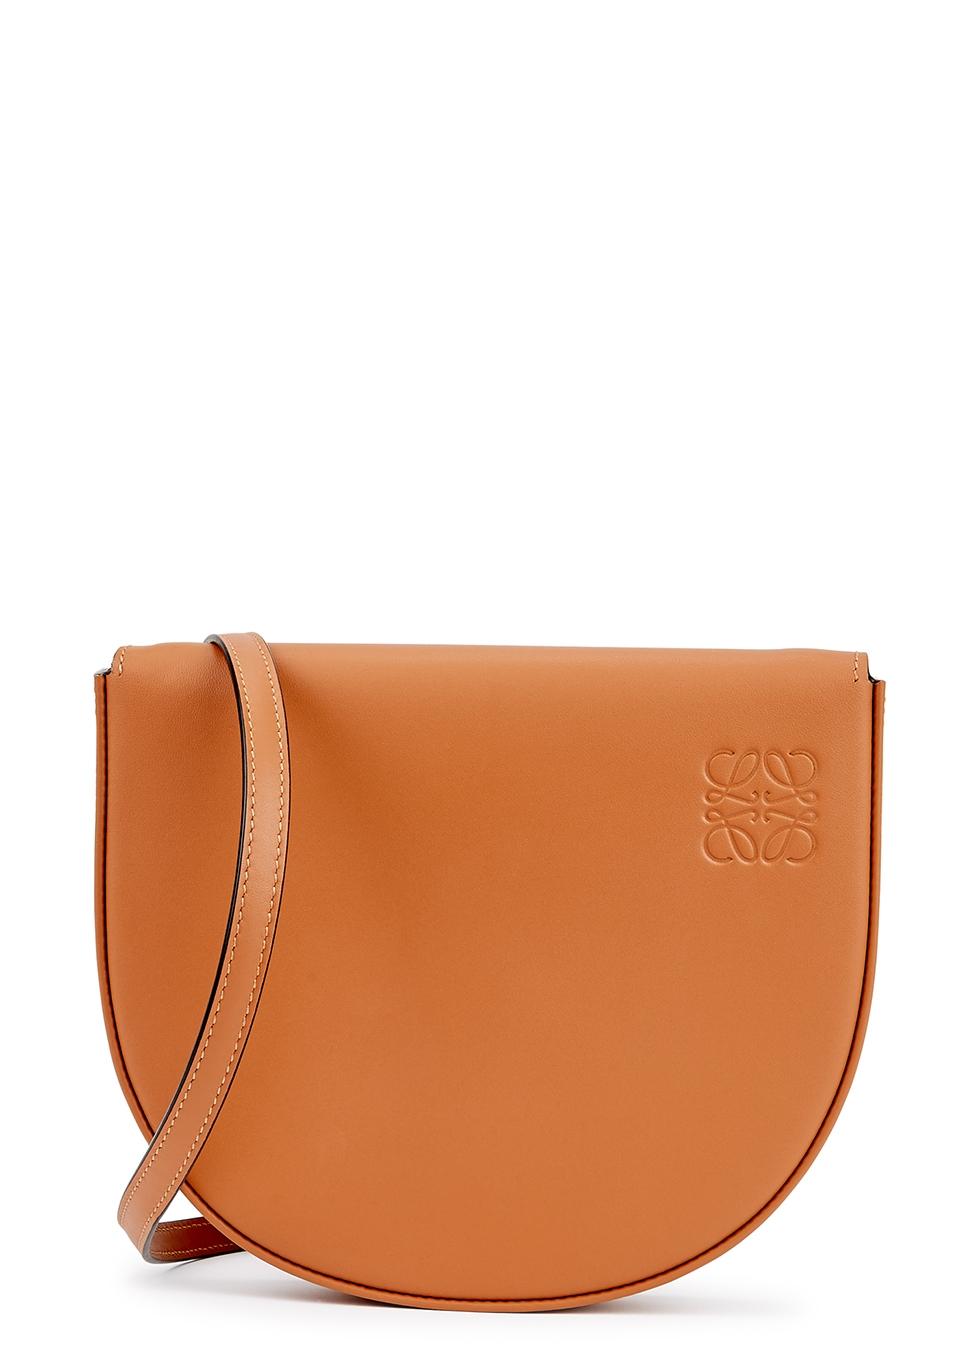 Heel brown leather cross-body bag